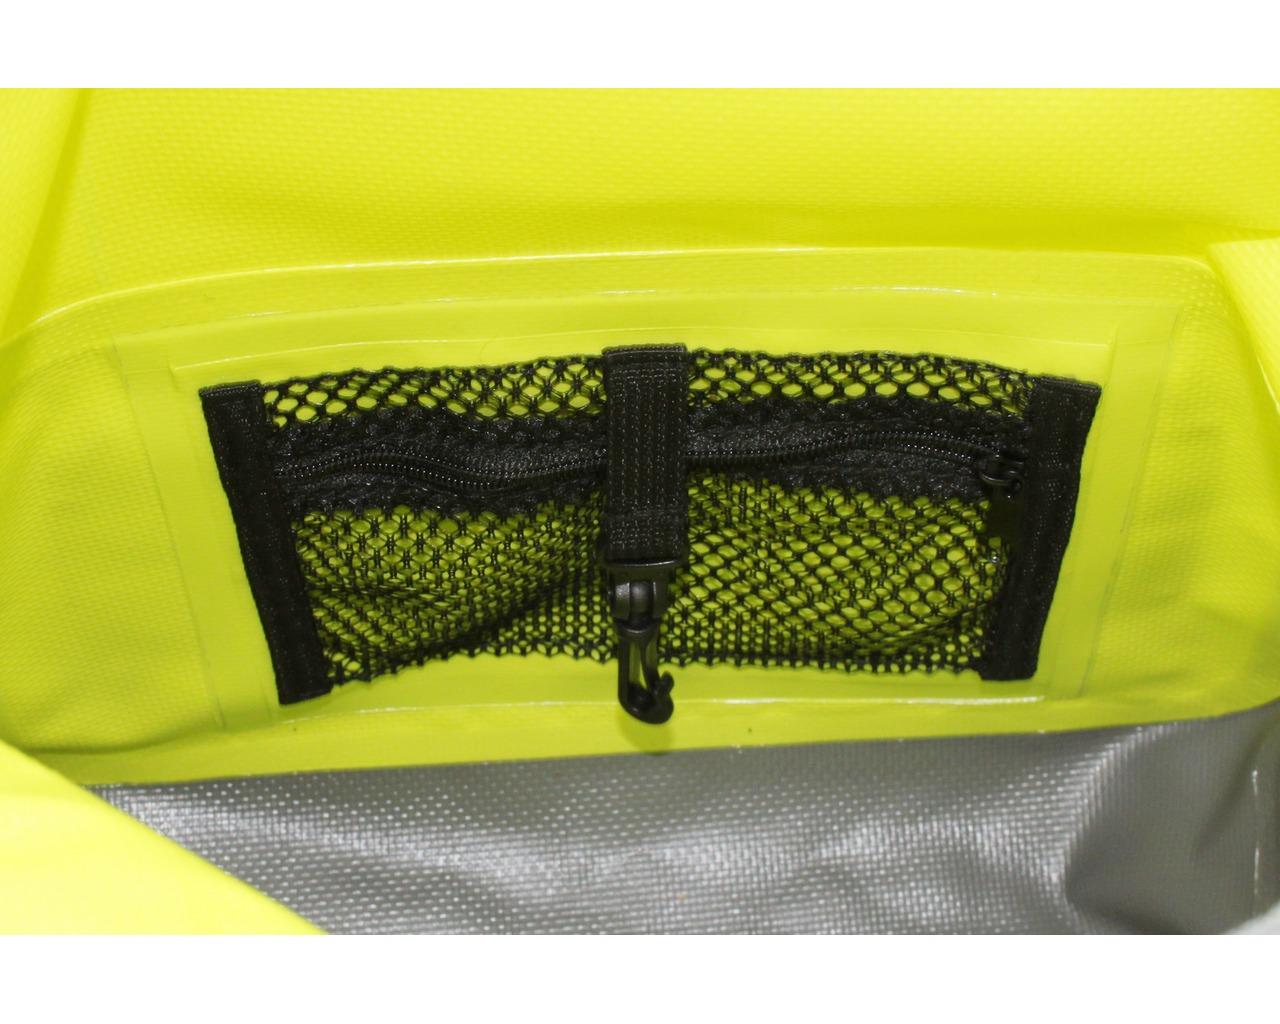 Водонепроницаемый чехол для документов - Aquapac 821. Aquapac - №1 в мире водонепроницаемых чехлов и сумок. Фото 4